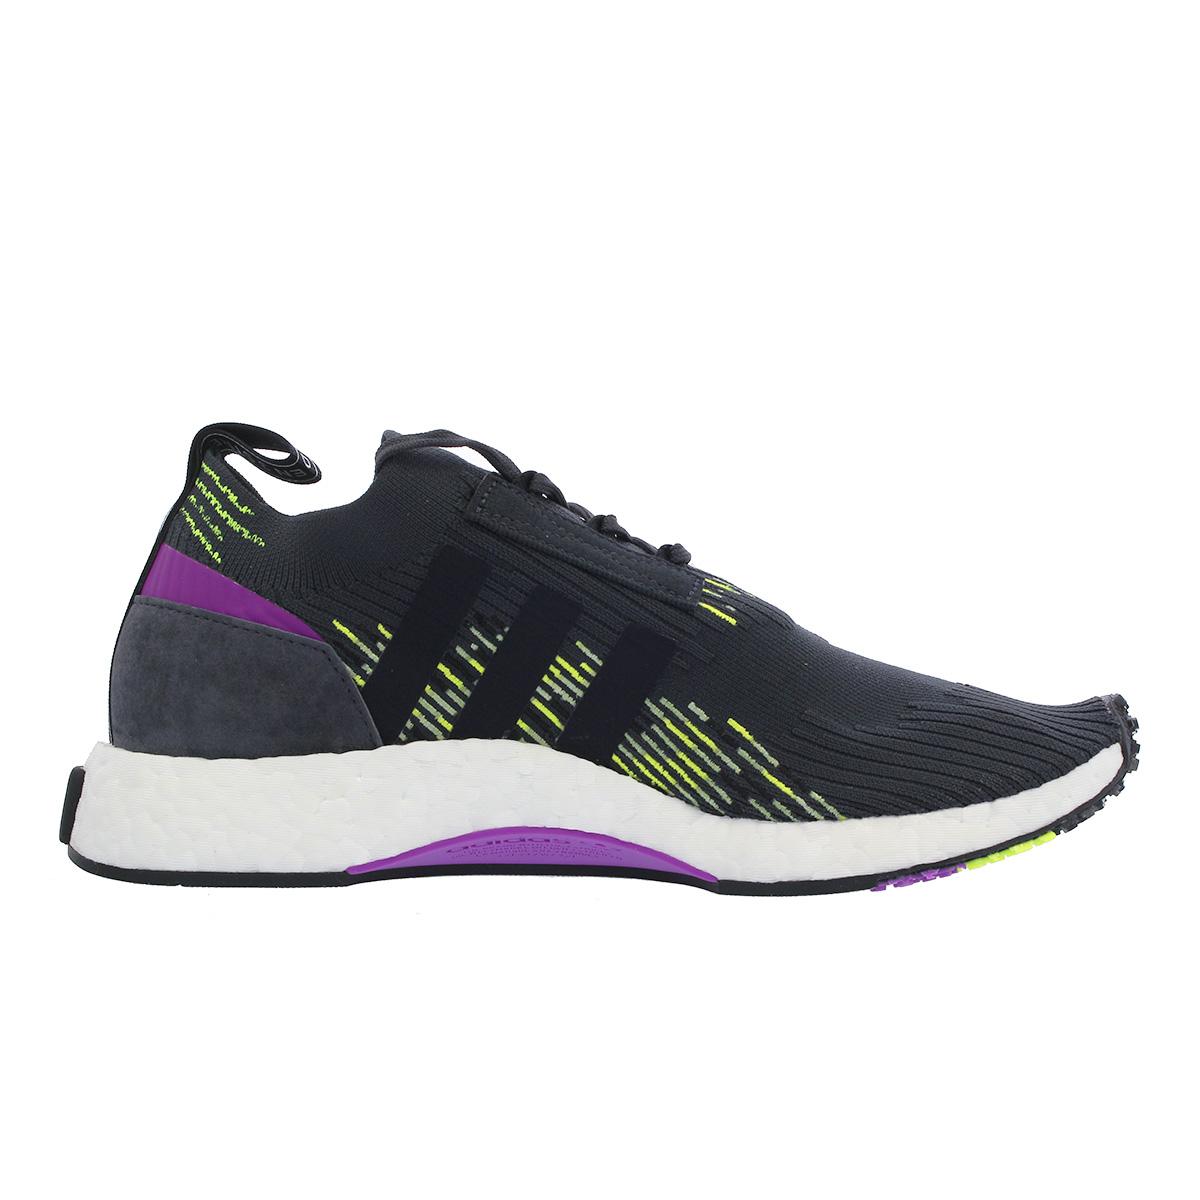 LOWTEX PLUS adidas NMD_RACER PK Adidas